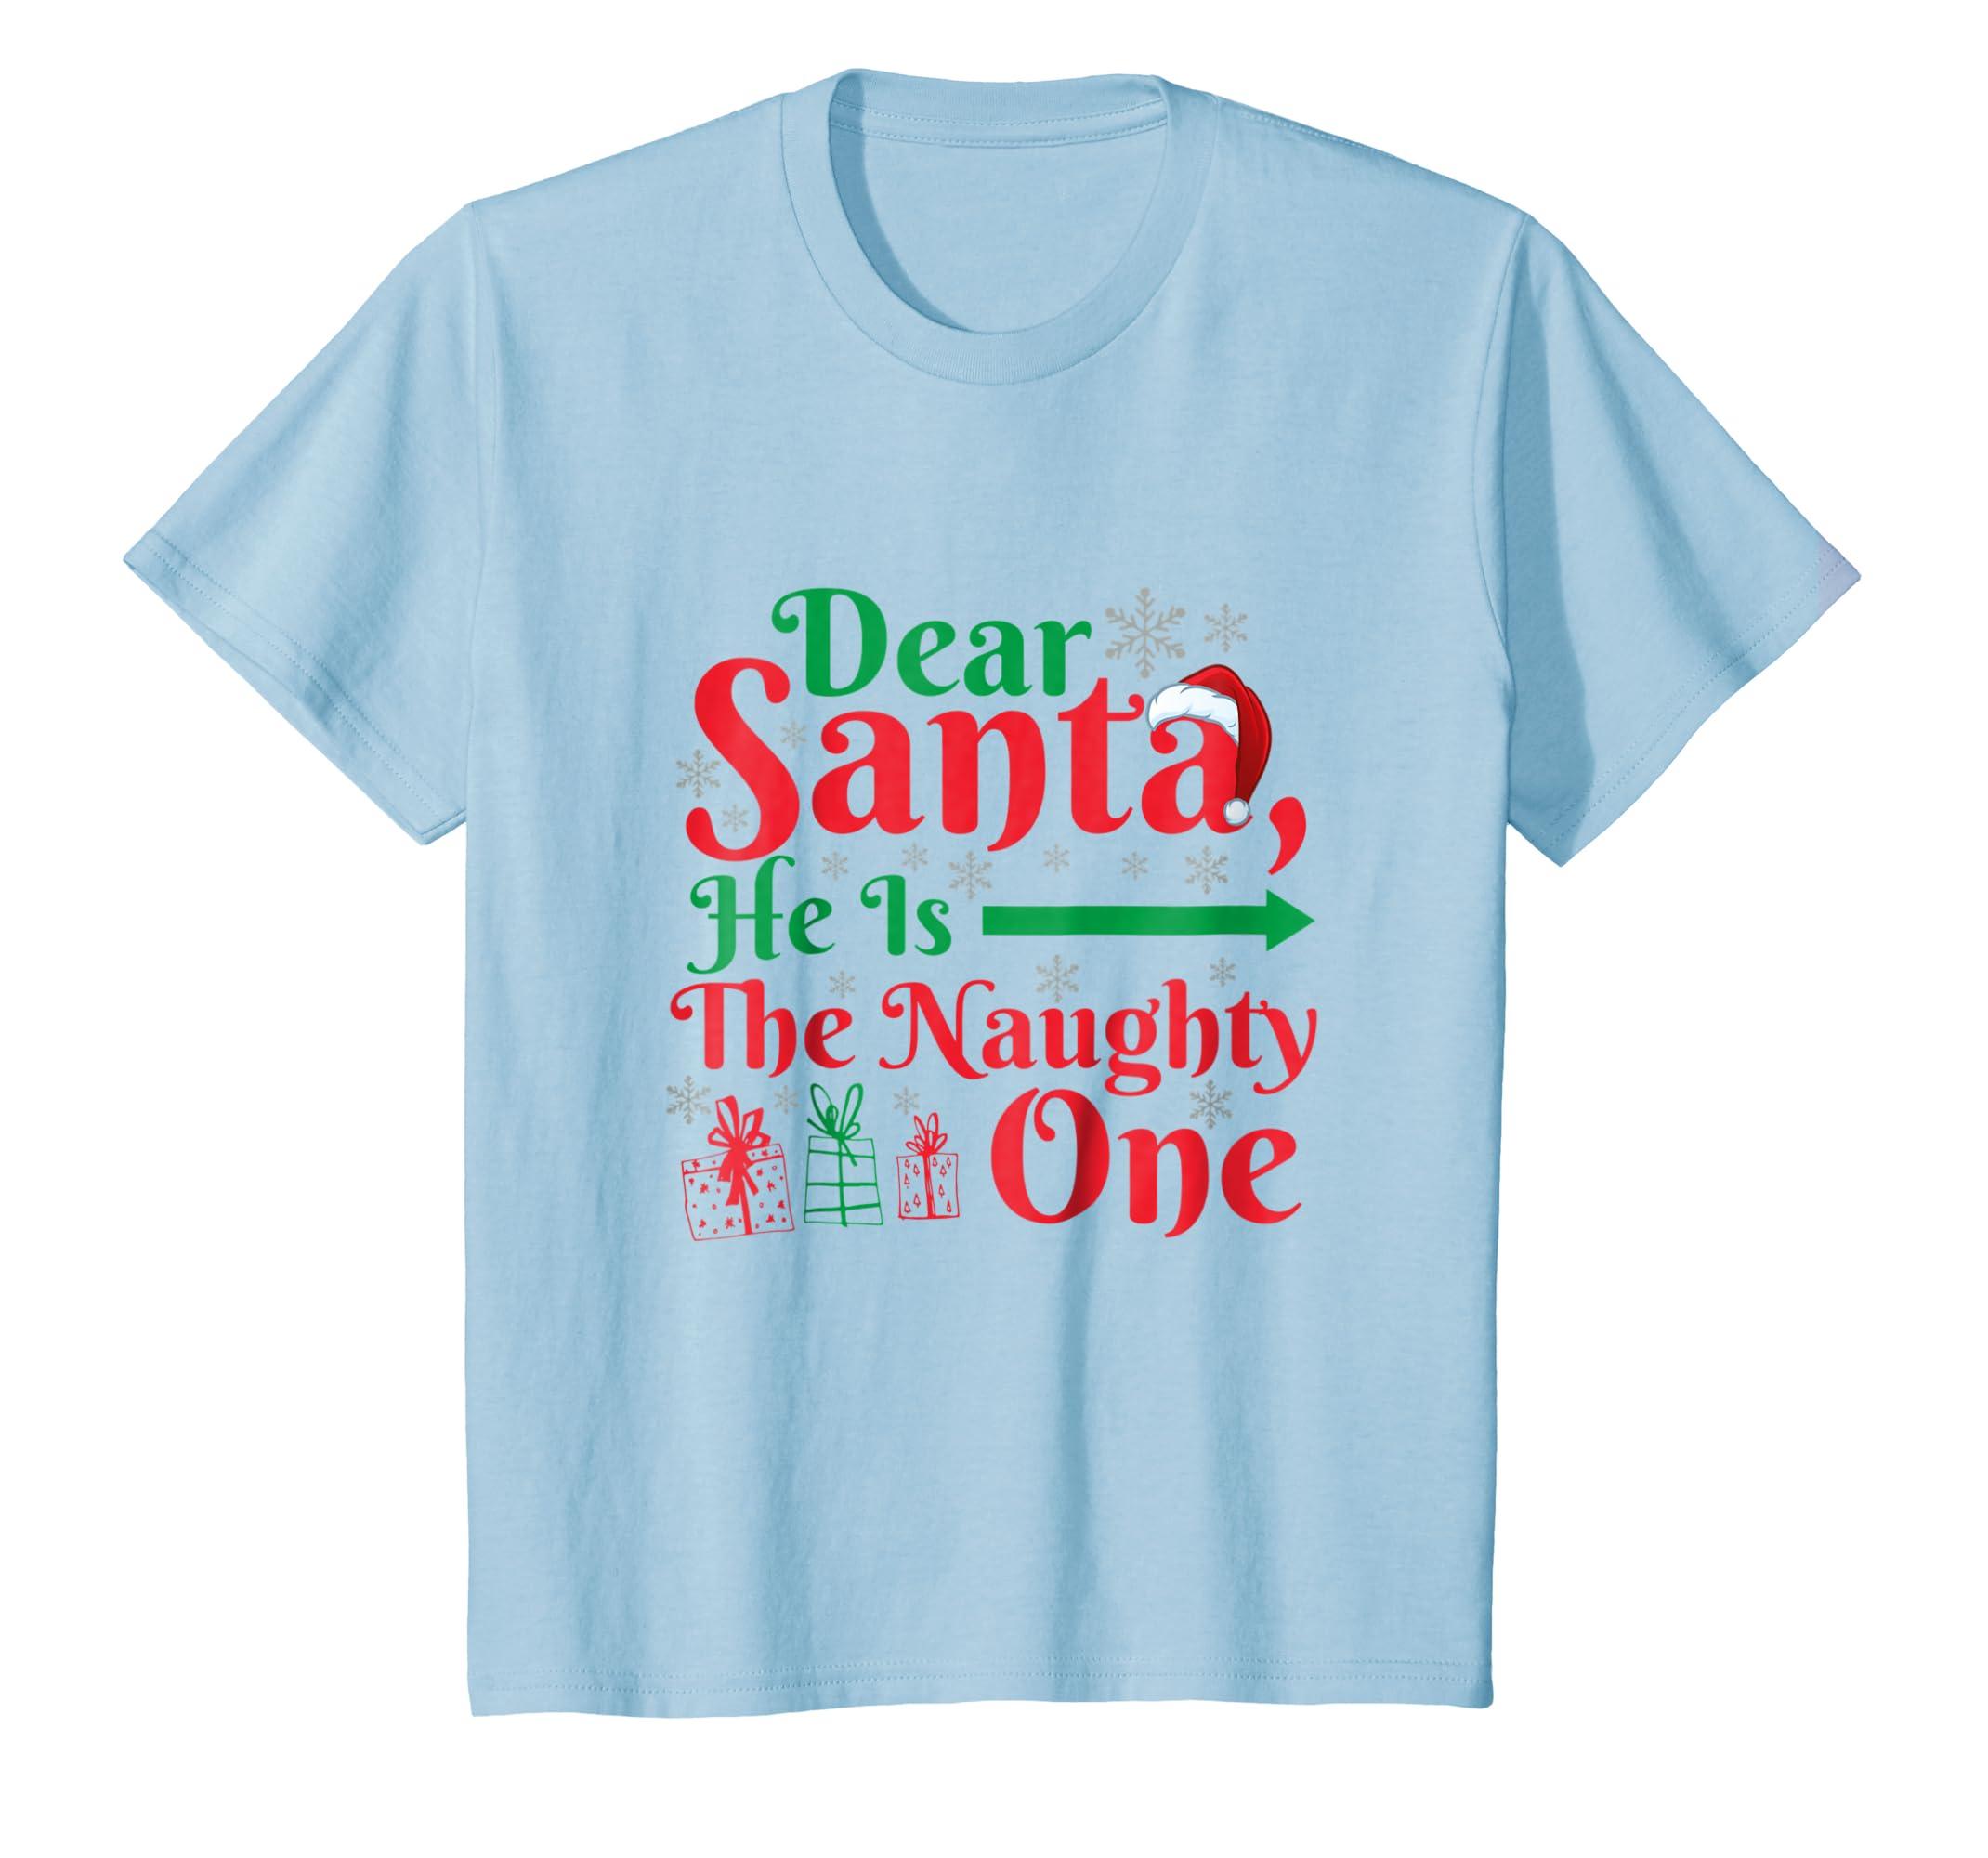 640e55de5 Amazon.com: Dear Santa He Is The Naughty One Shirt Xmas Matching Tee:  Clothing